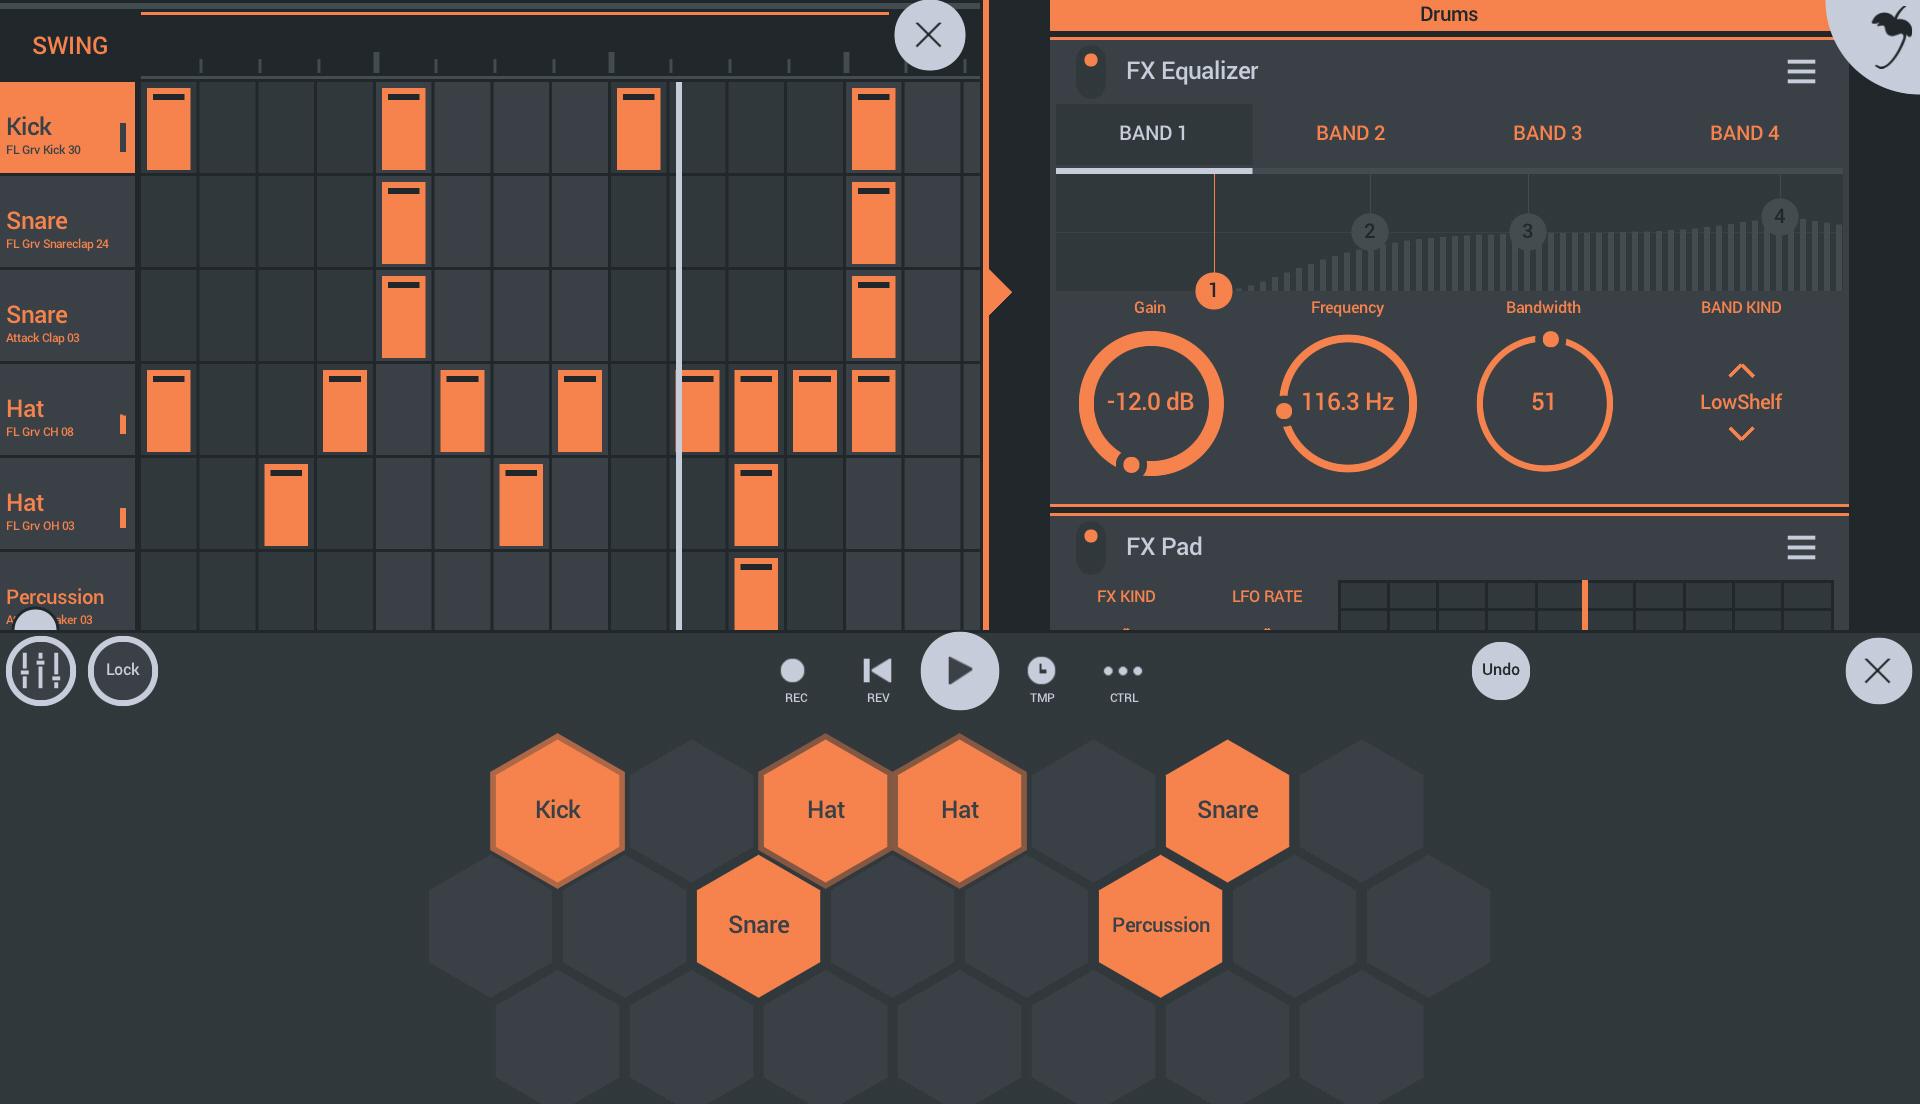 KVR: FL Studio Mobile by Image Line - Virtual Studio